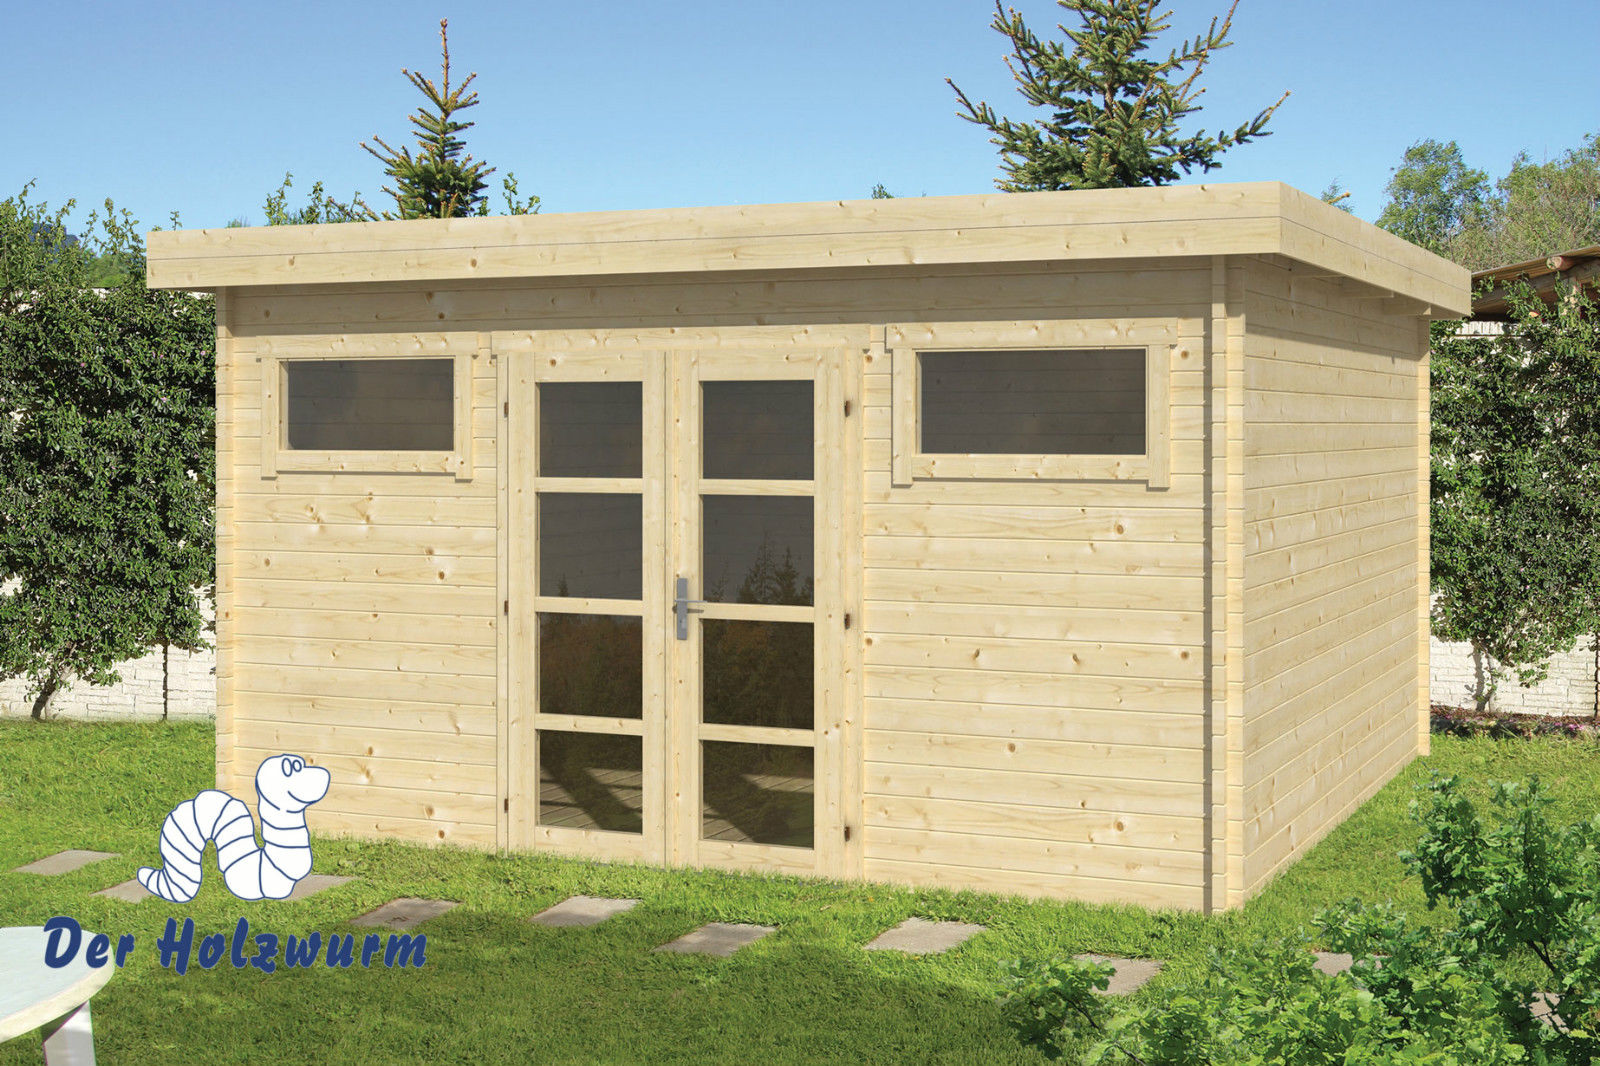 gartenhaus supermodern 40 mm ca 420x420 cm holzwurm obersayn. Black Bedroom Furniture Sets. Home Design Ideas